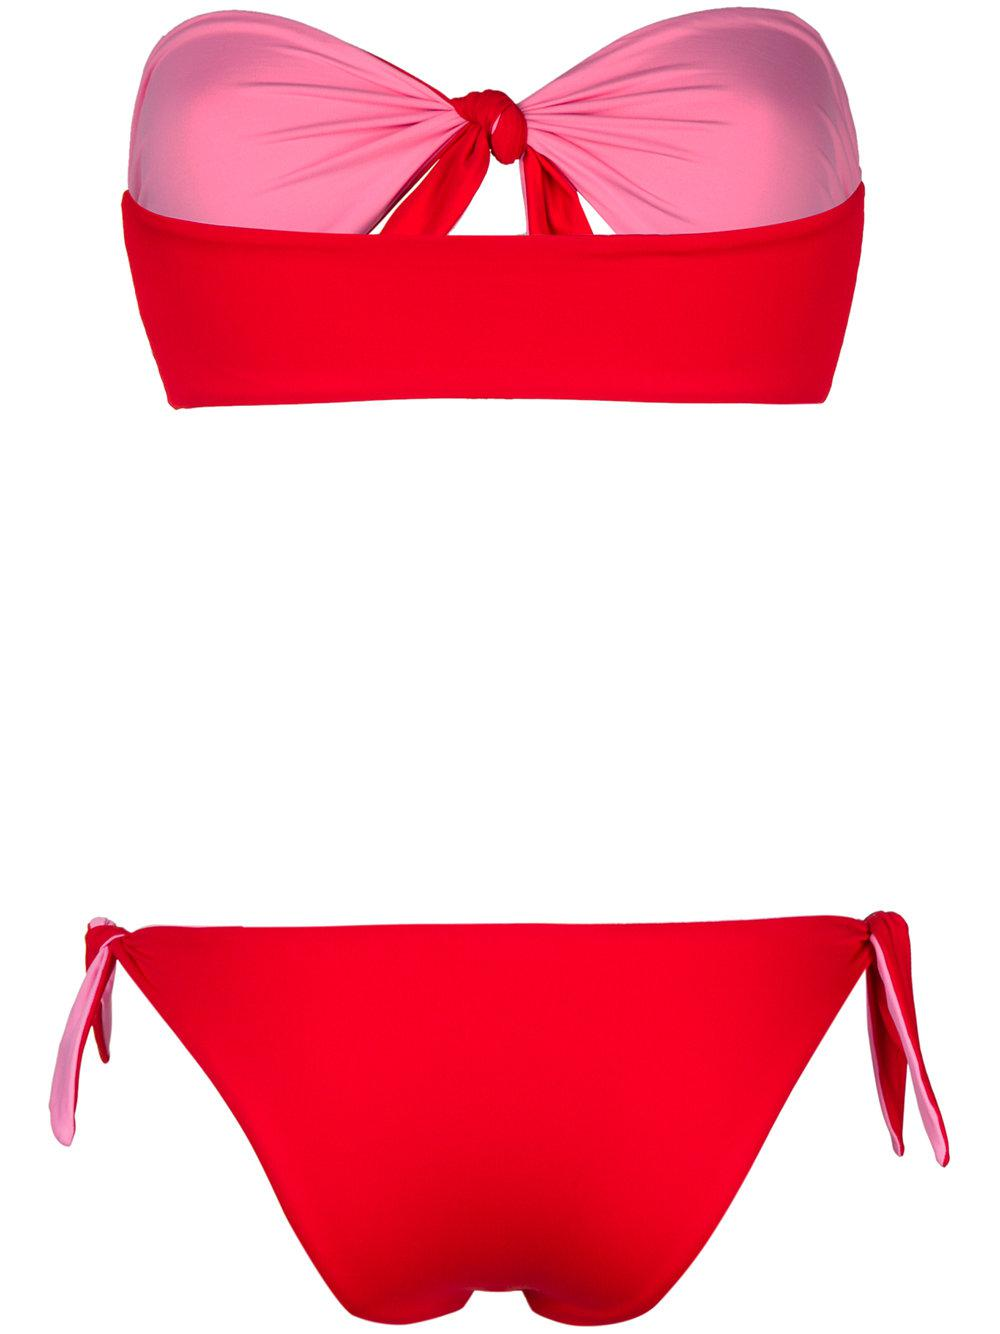 Murtoli reversible bikini set - Red Tara Matthews Inexpensive Online Outlet Countdown Package Online Shop Free Shipping Ebay aPSfz4pl